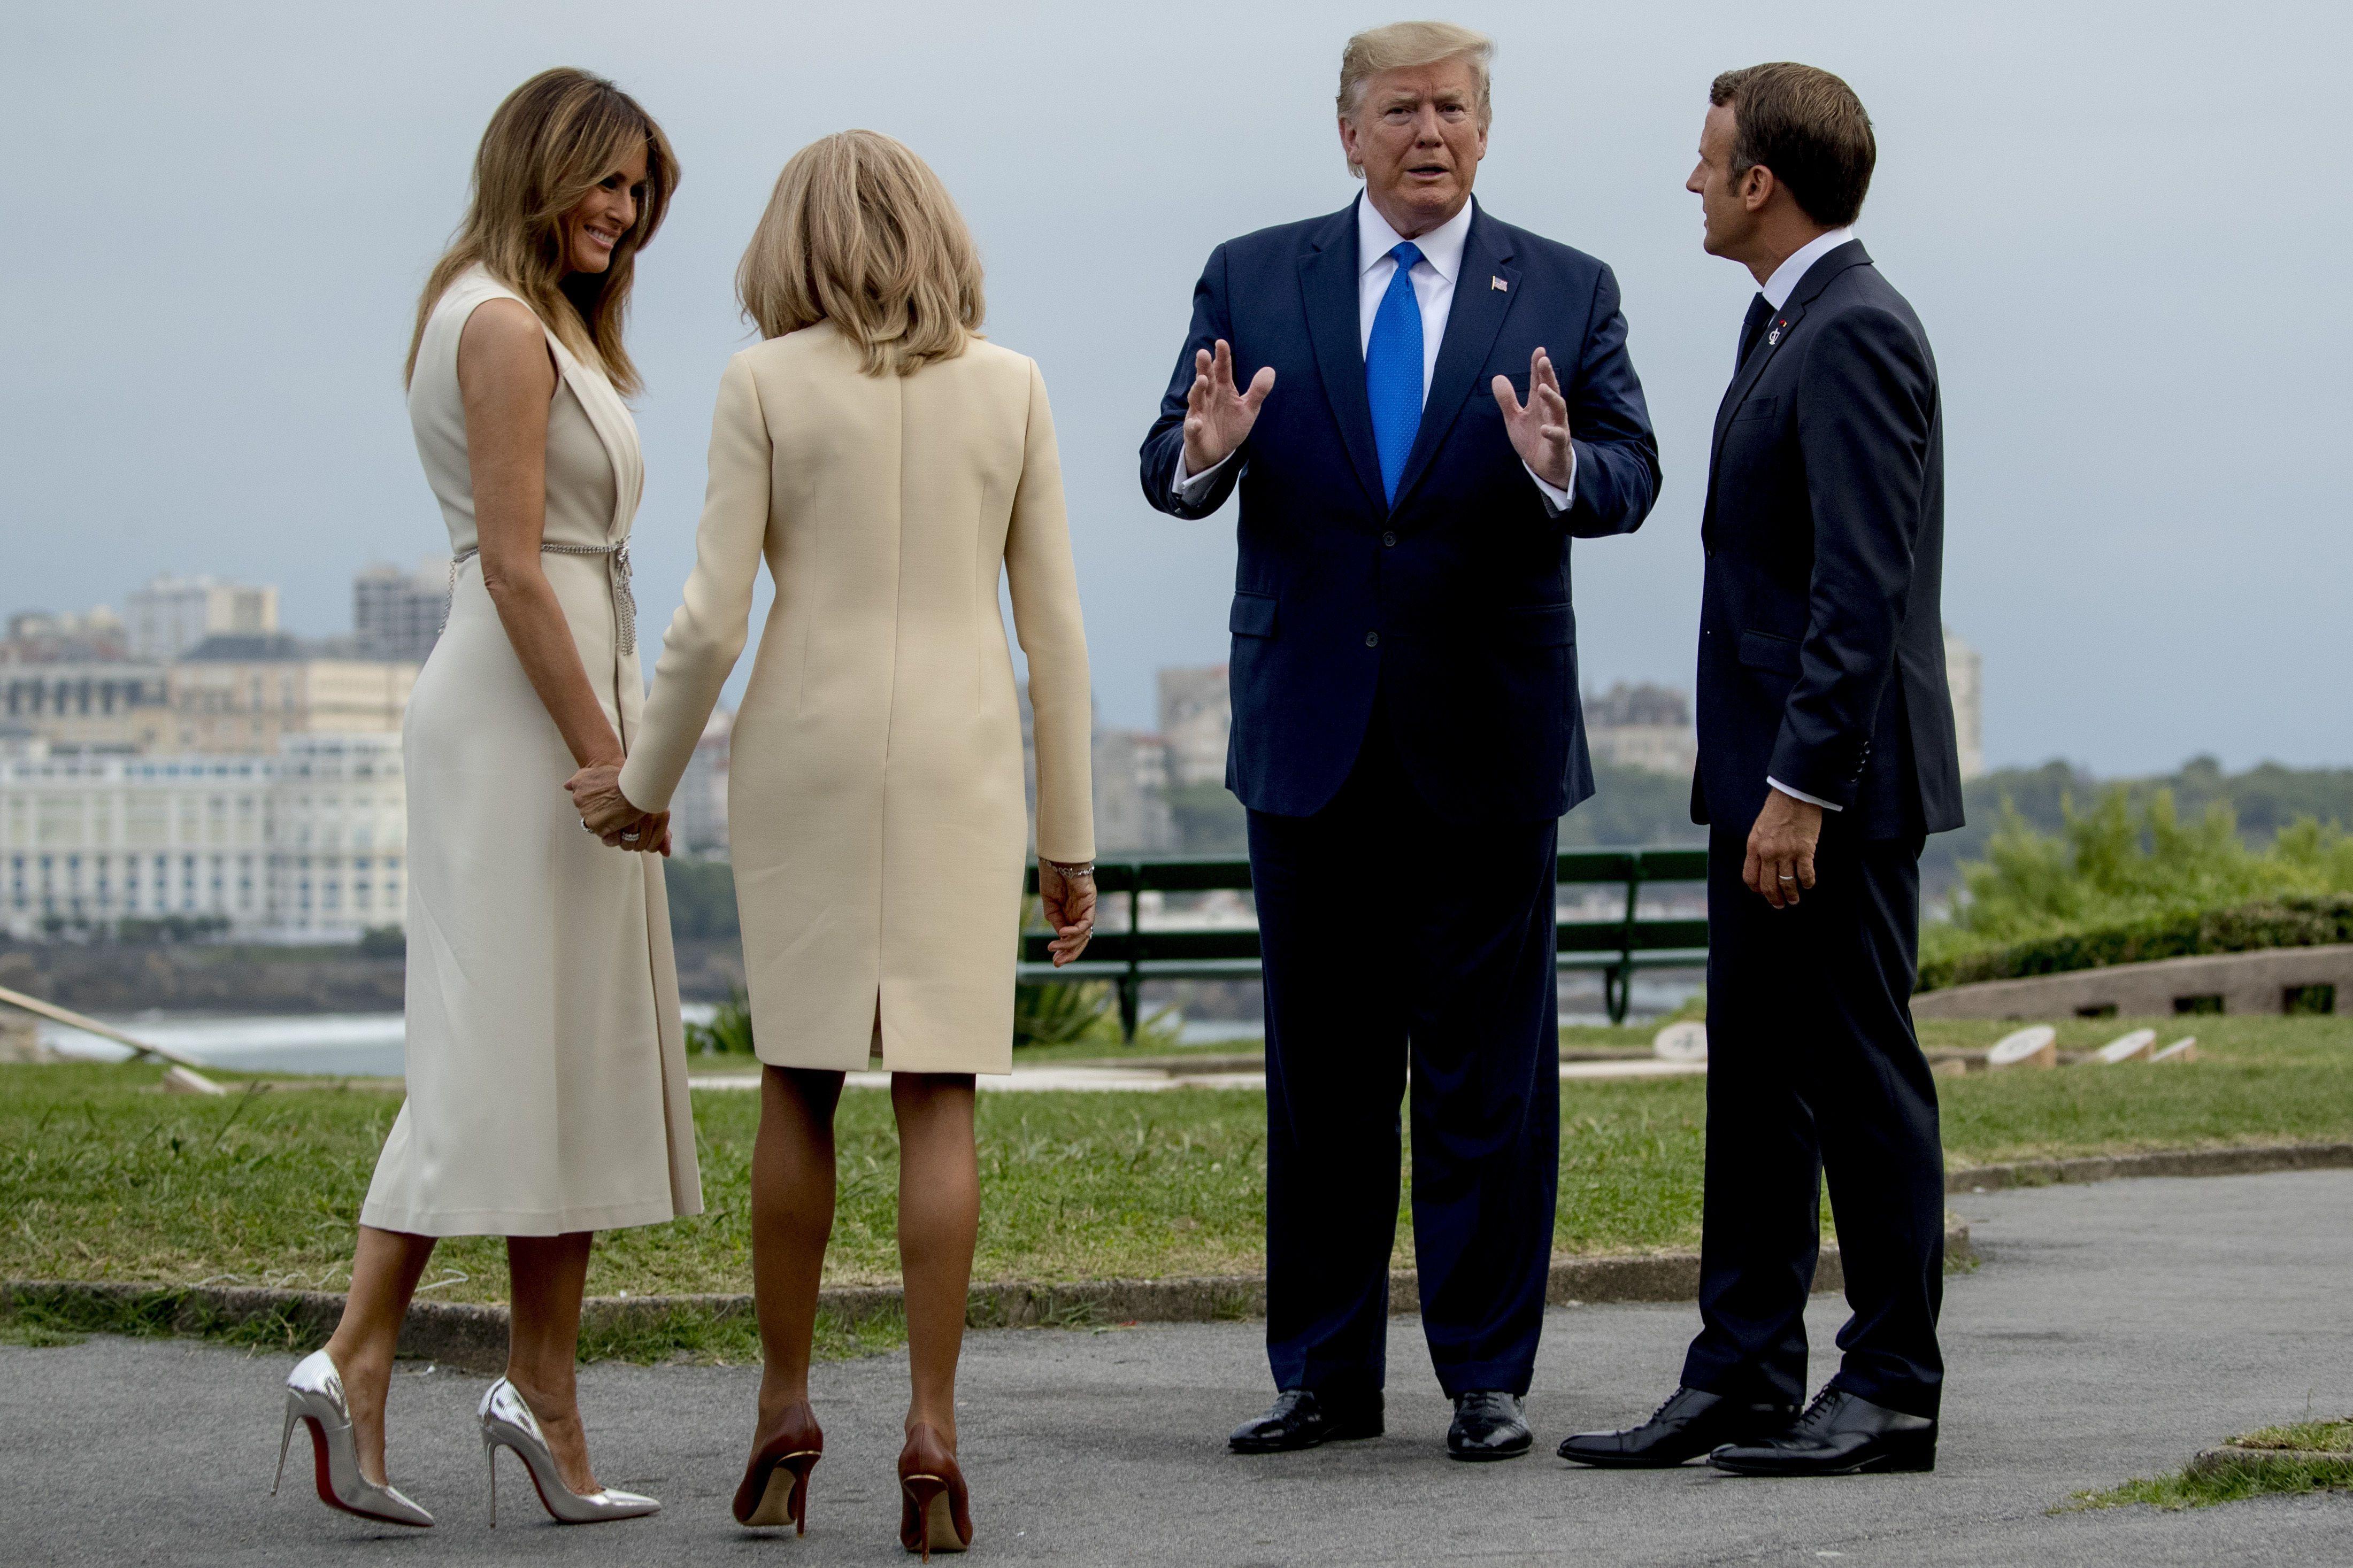 G7, Велика сімка, Трамп, Макрон